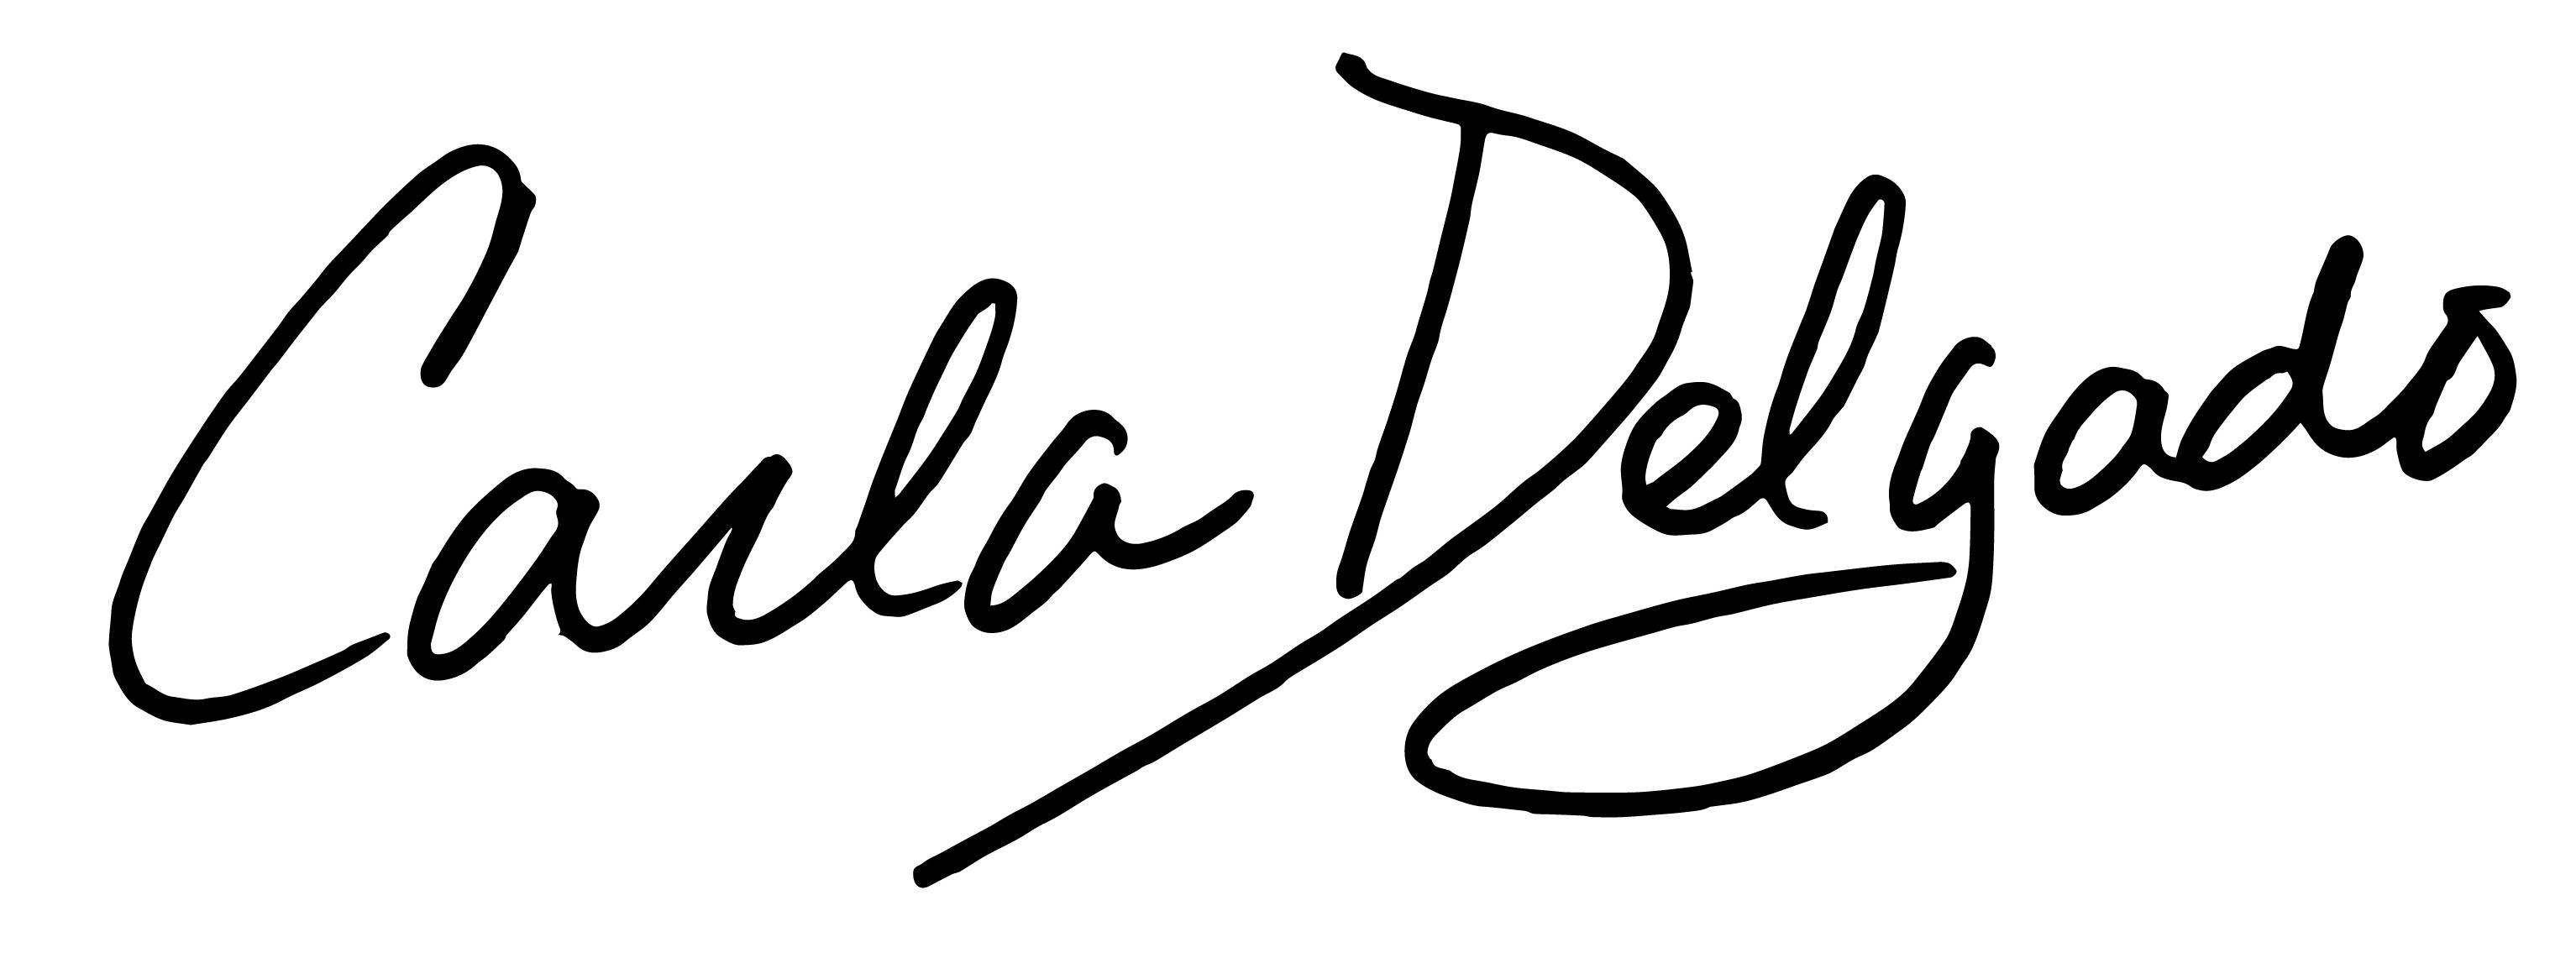 Carla Delgado Signature